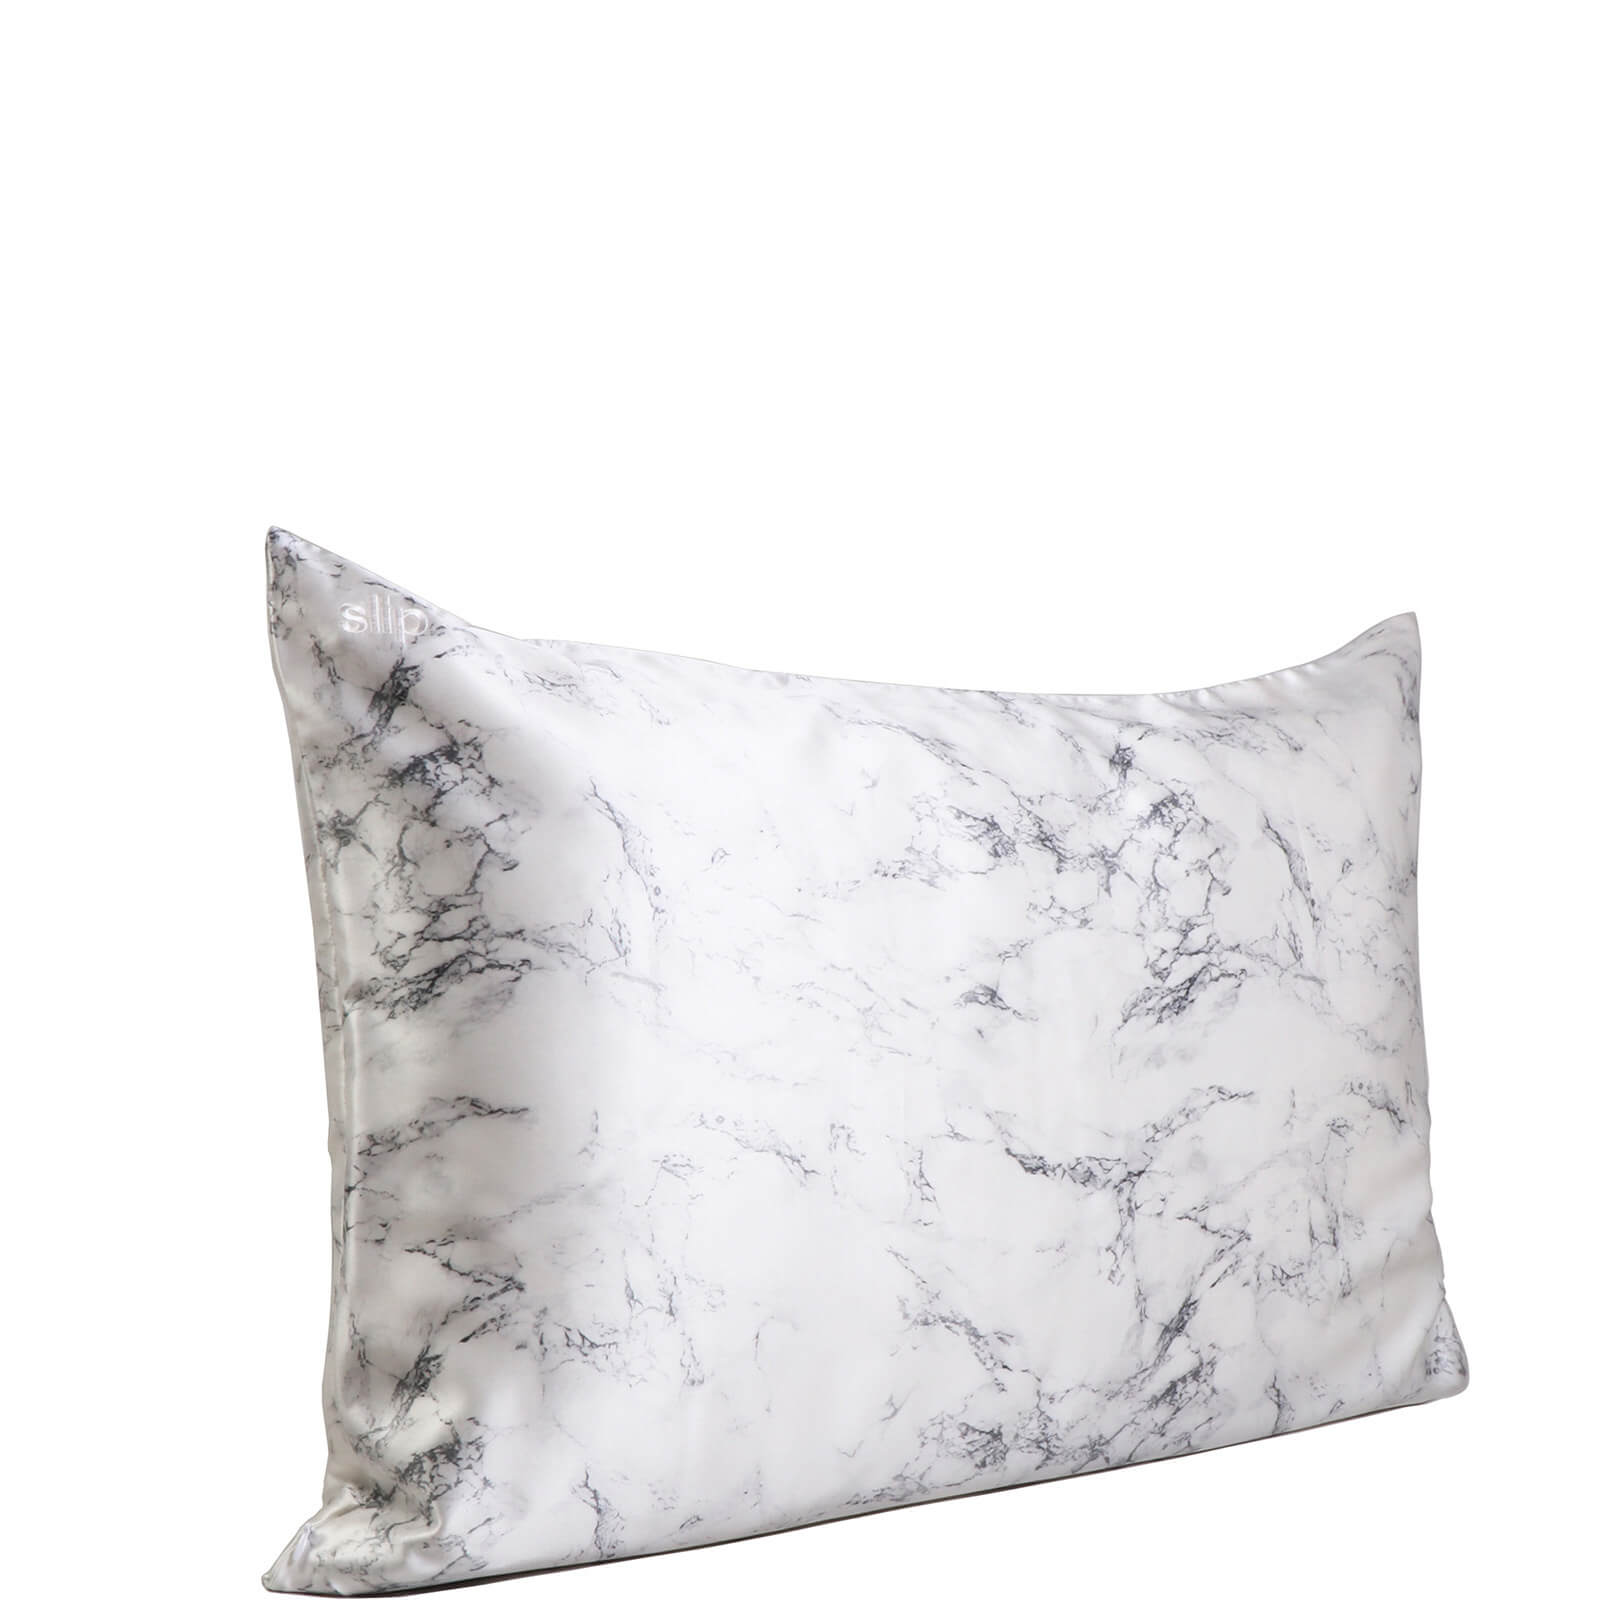 Slip Silk Pillowcase - Queen (Various Colors) - Marble